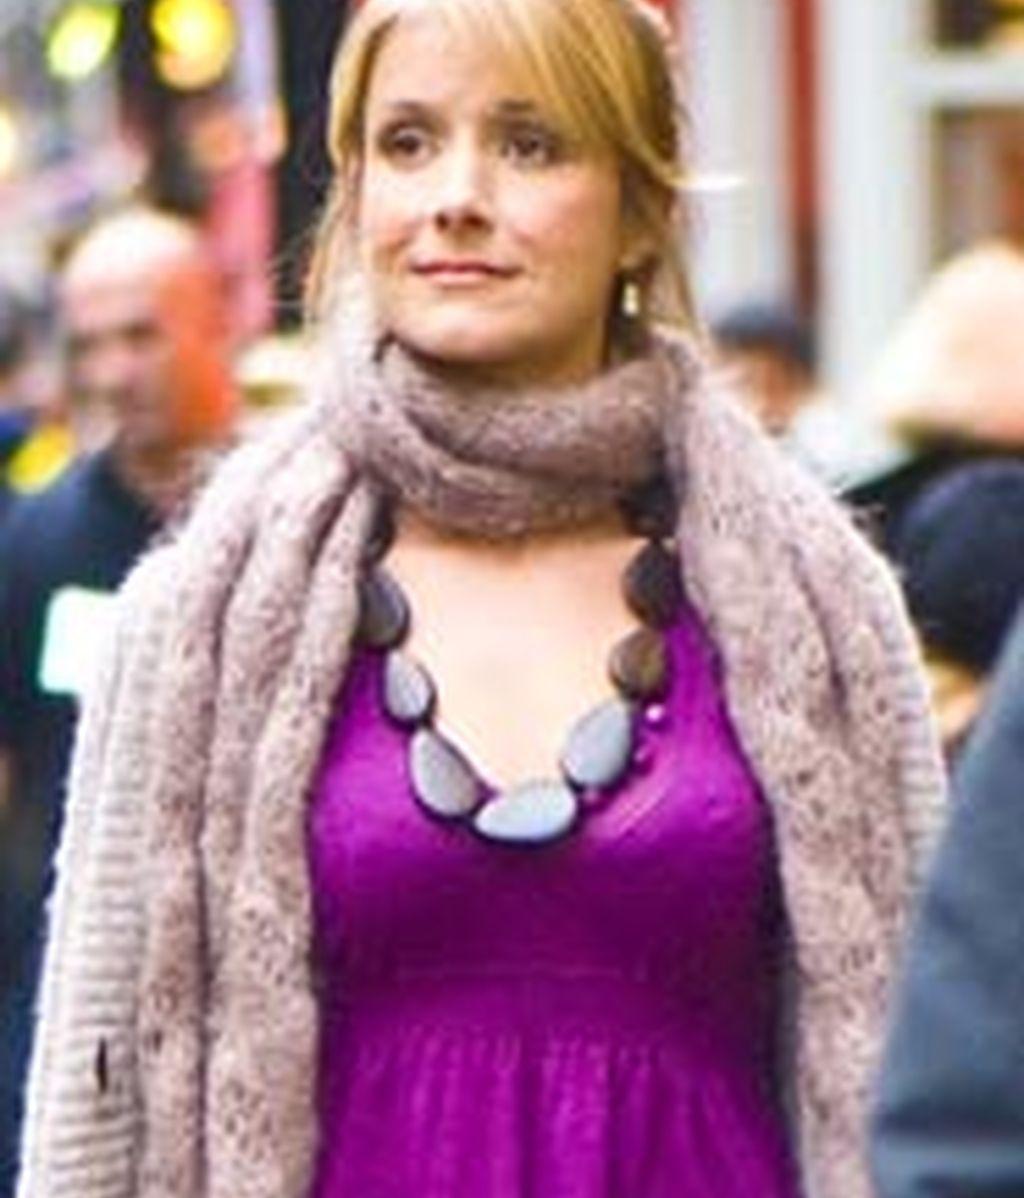 La doctora Brooke Magnanti. Foto: The Times